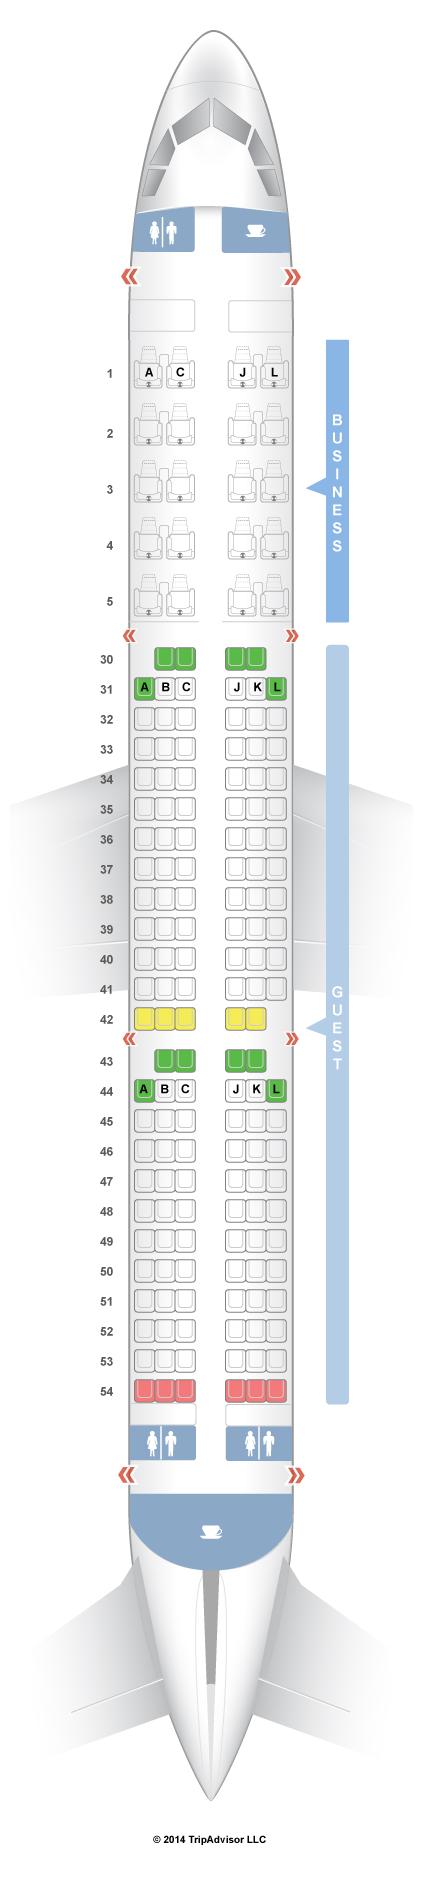 Alitalia Airbus A321 Seating Chart | Brokeasshome.com